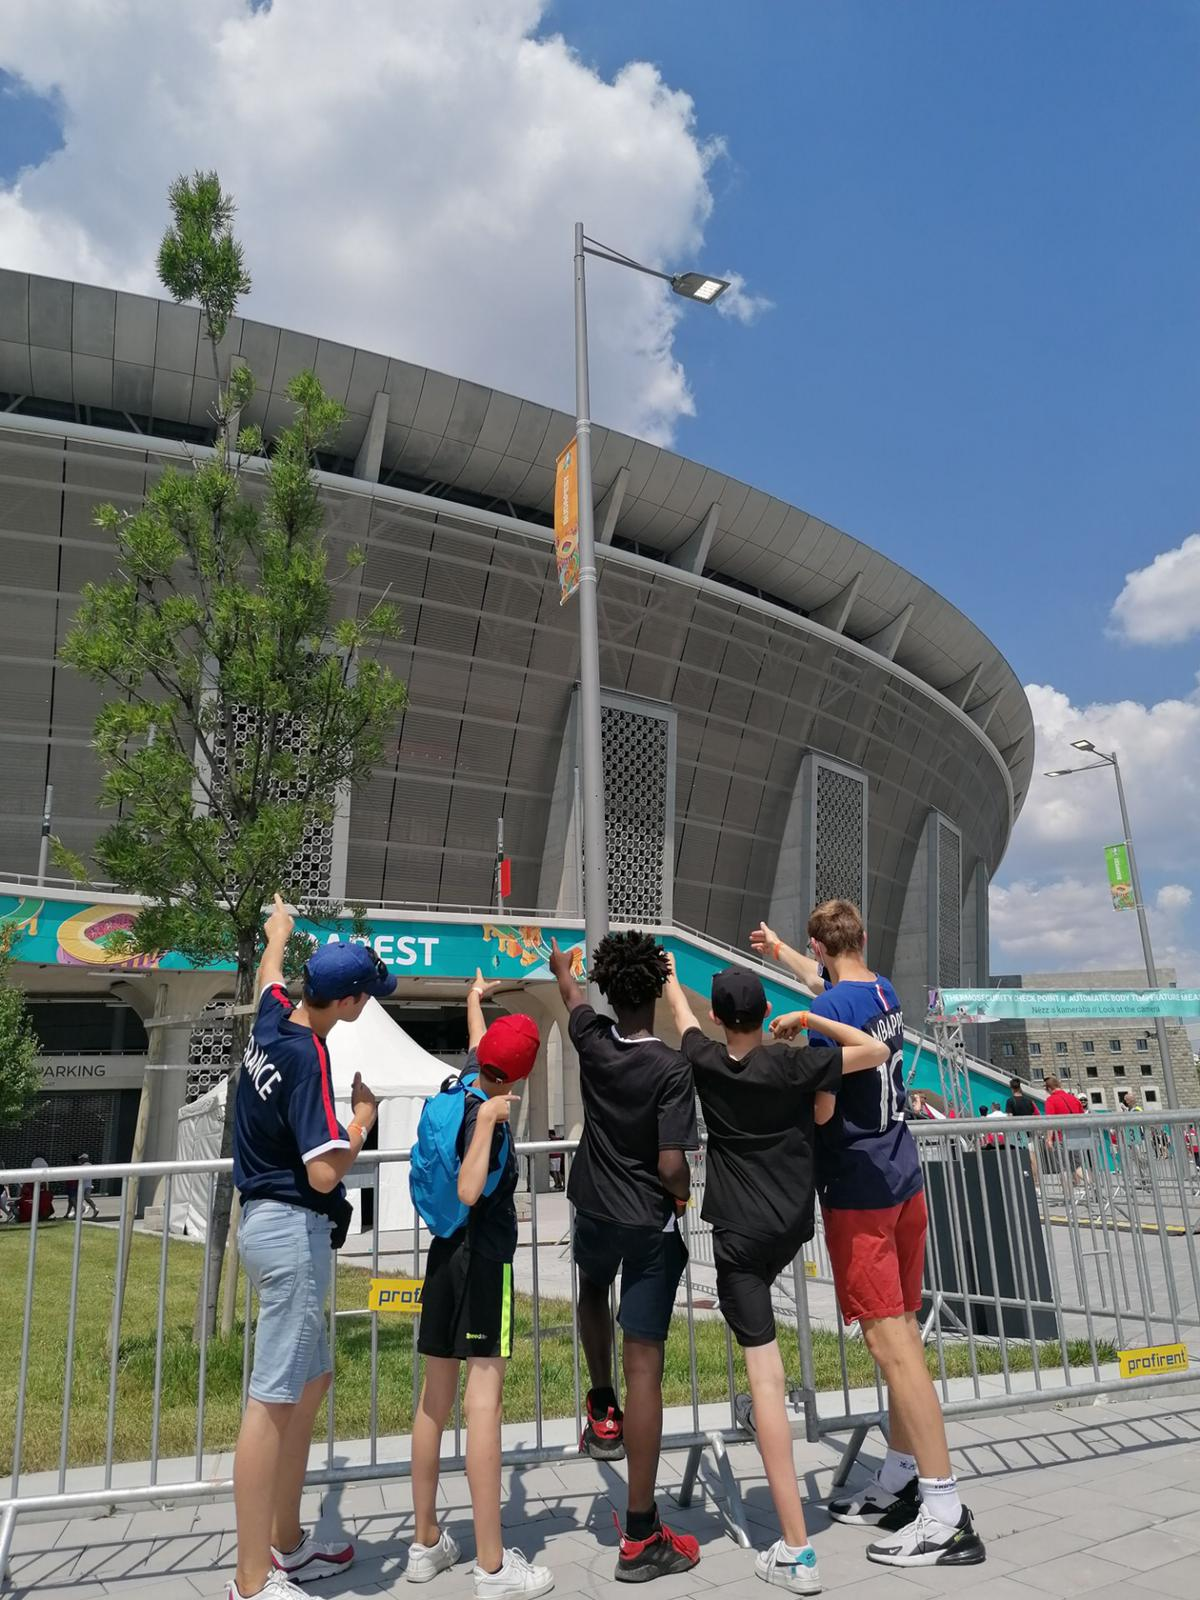 Devant le stade hongrois